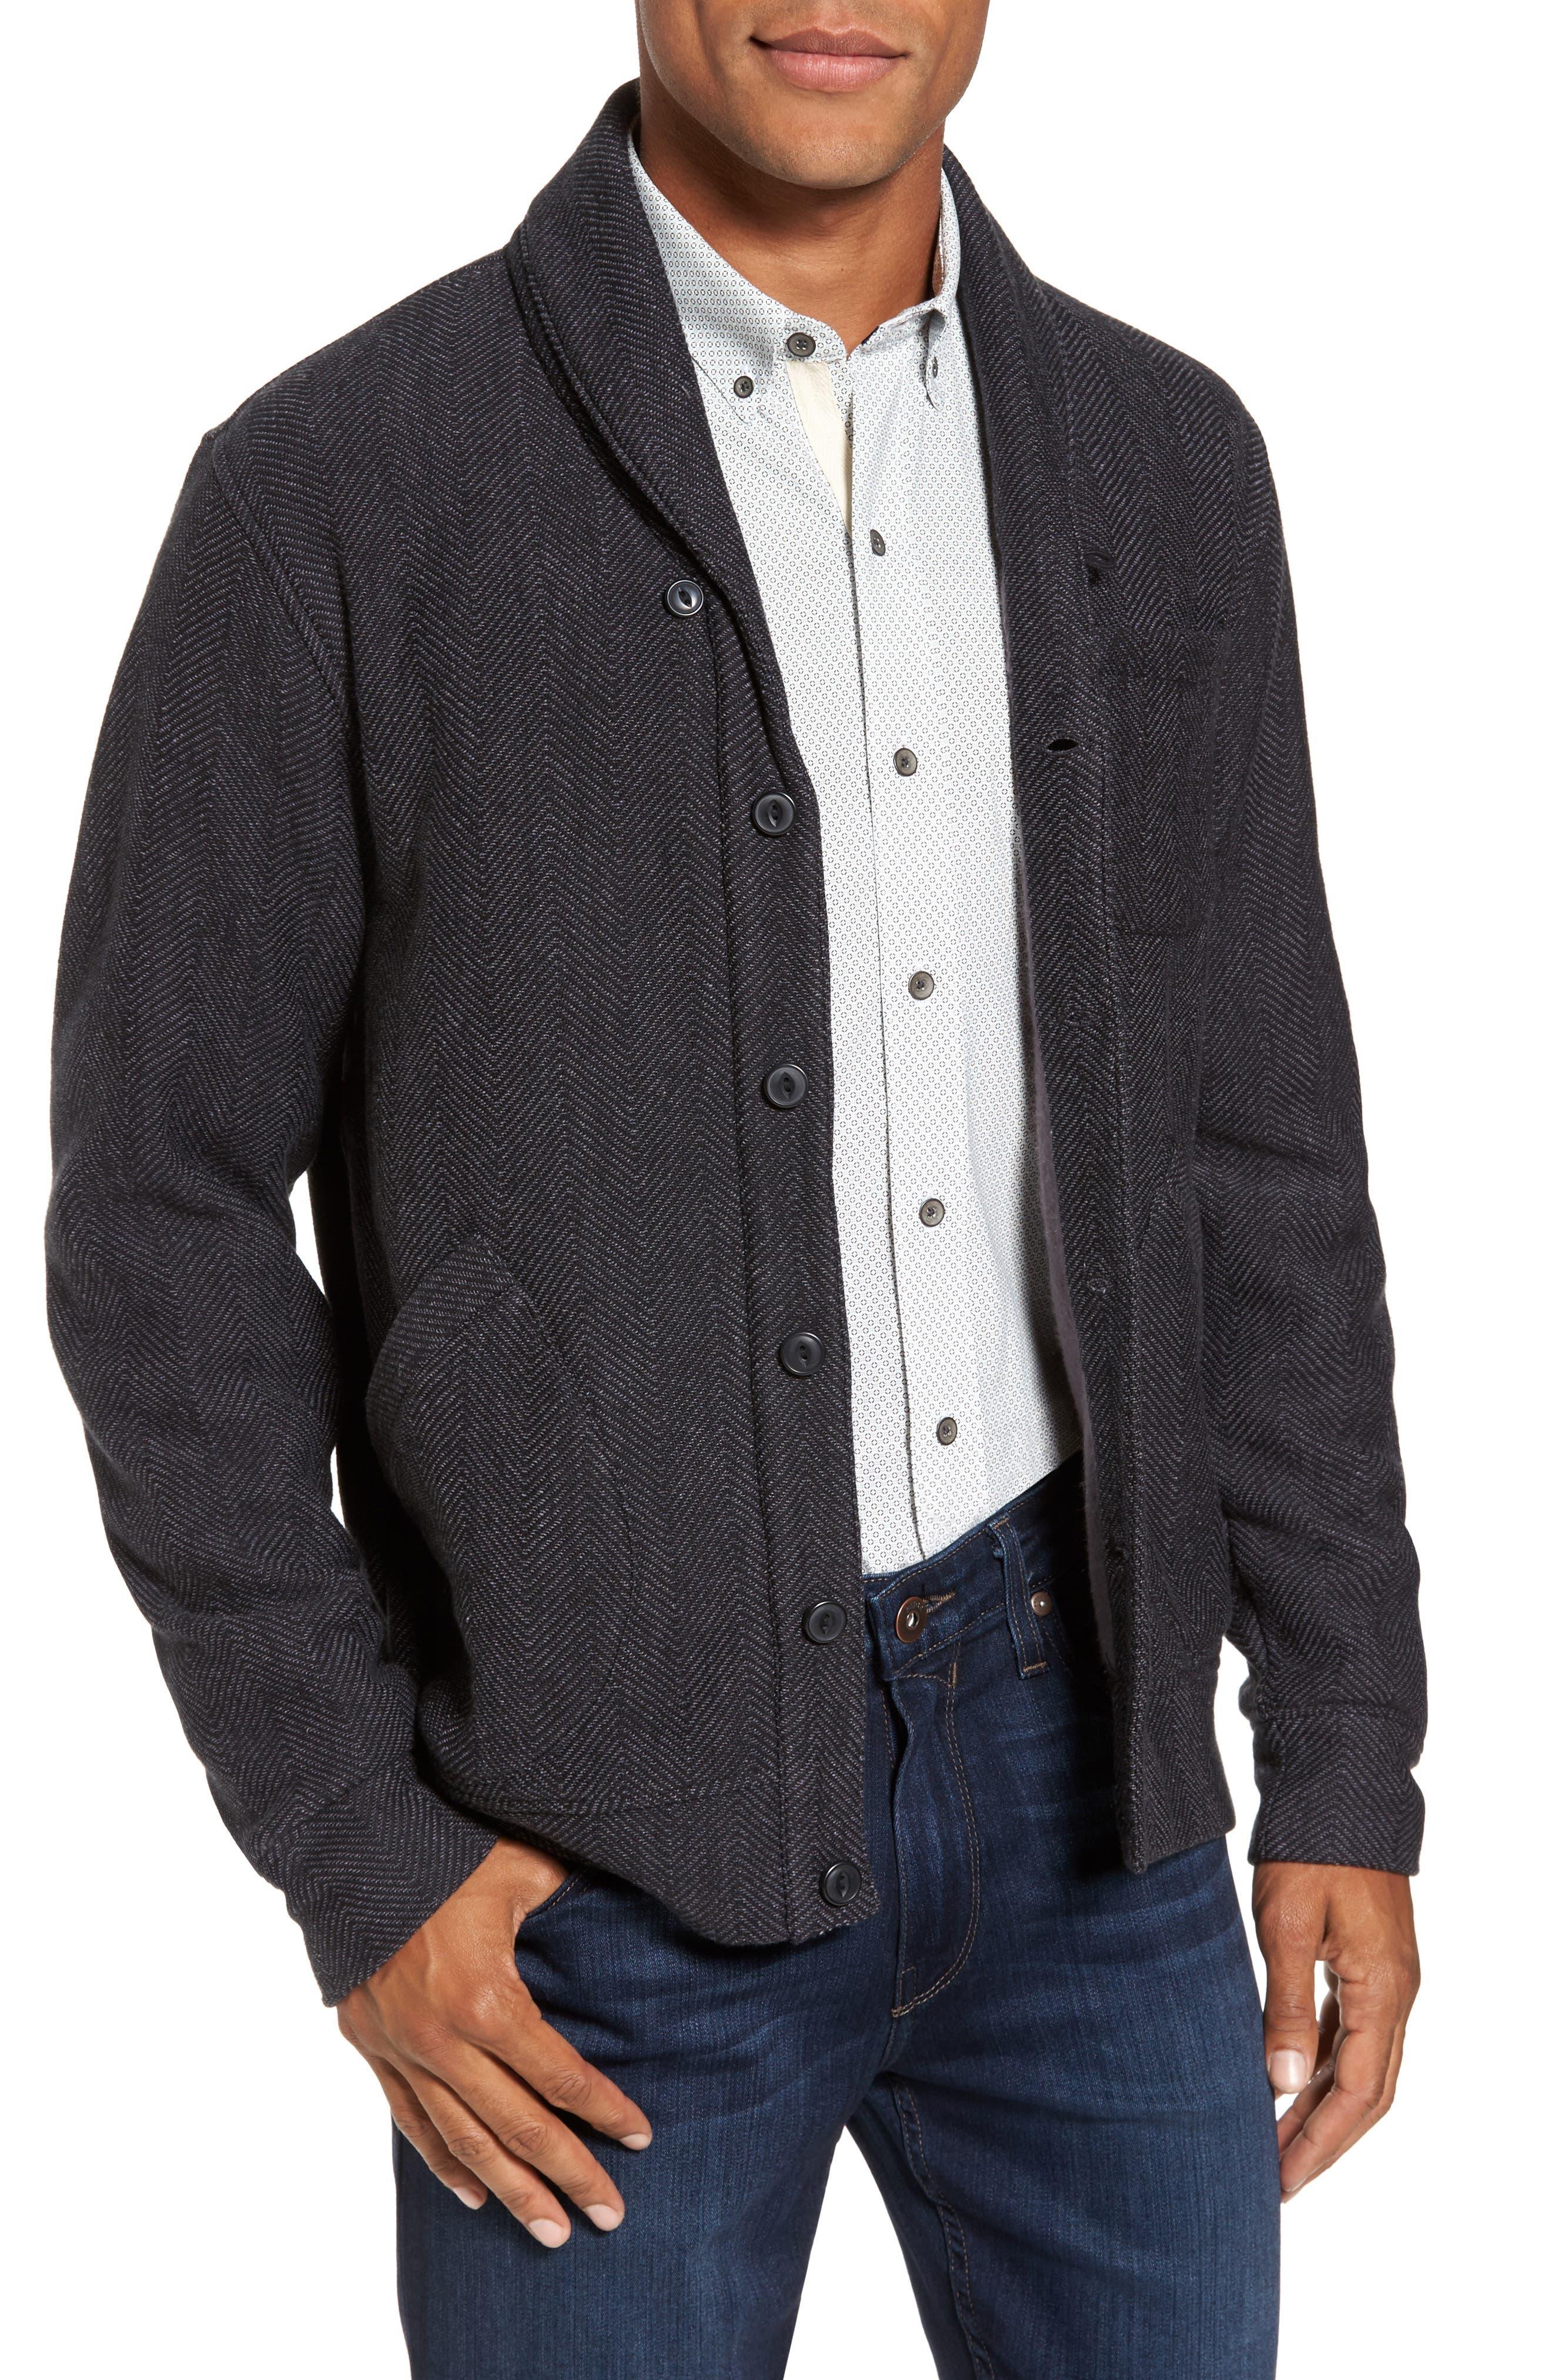 Fleece Lined Shawl Collar Cardigan,                             Main thumbnail 1, color,                             Grey Phantom Herringbone